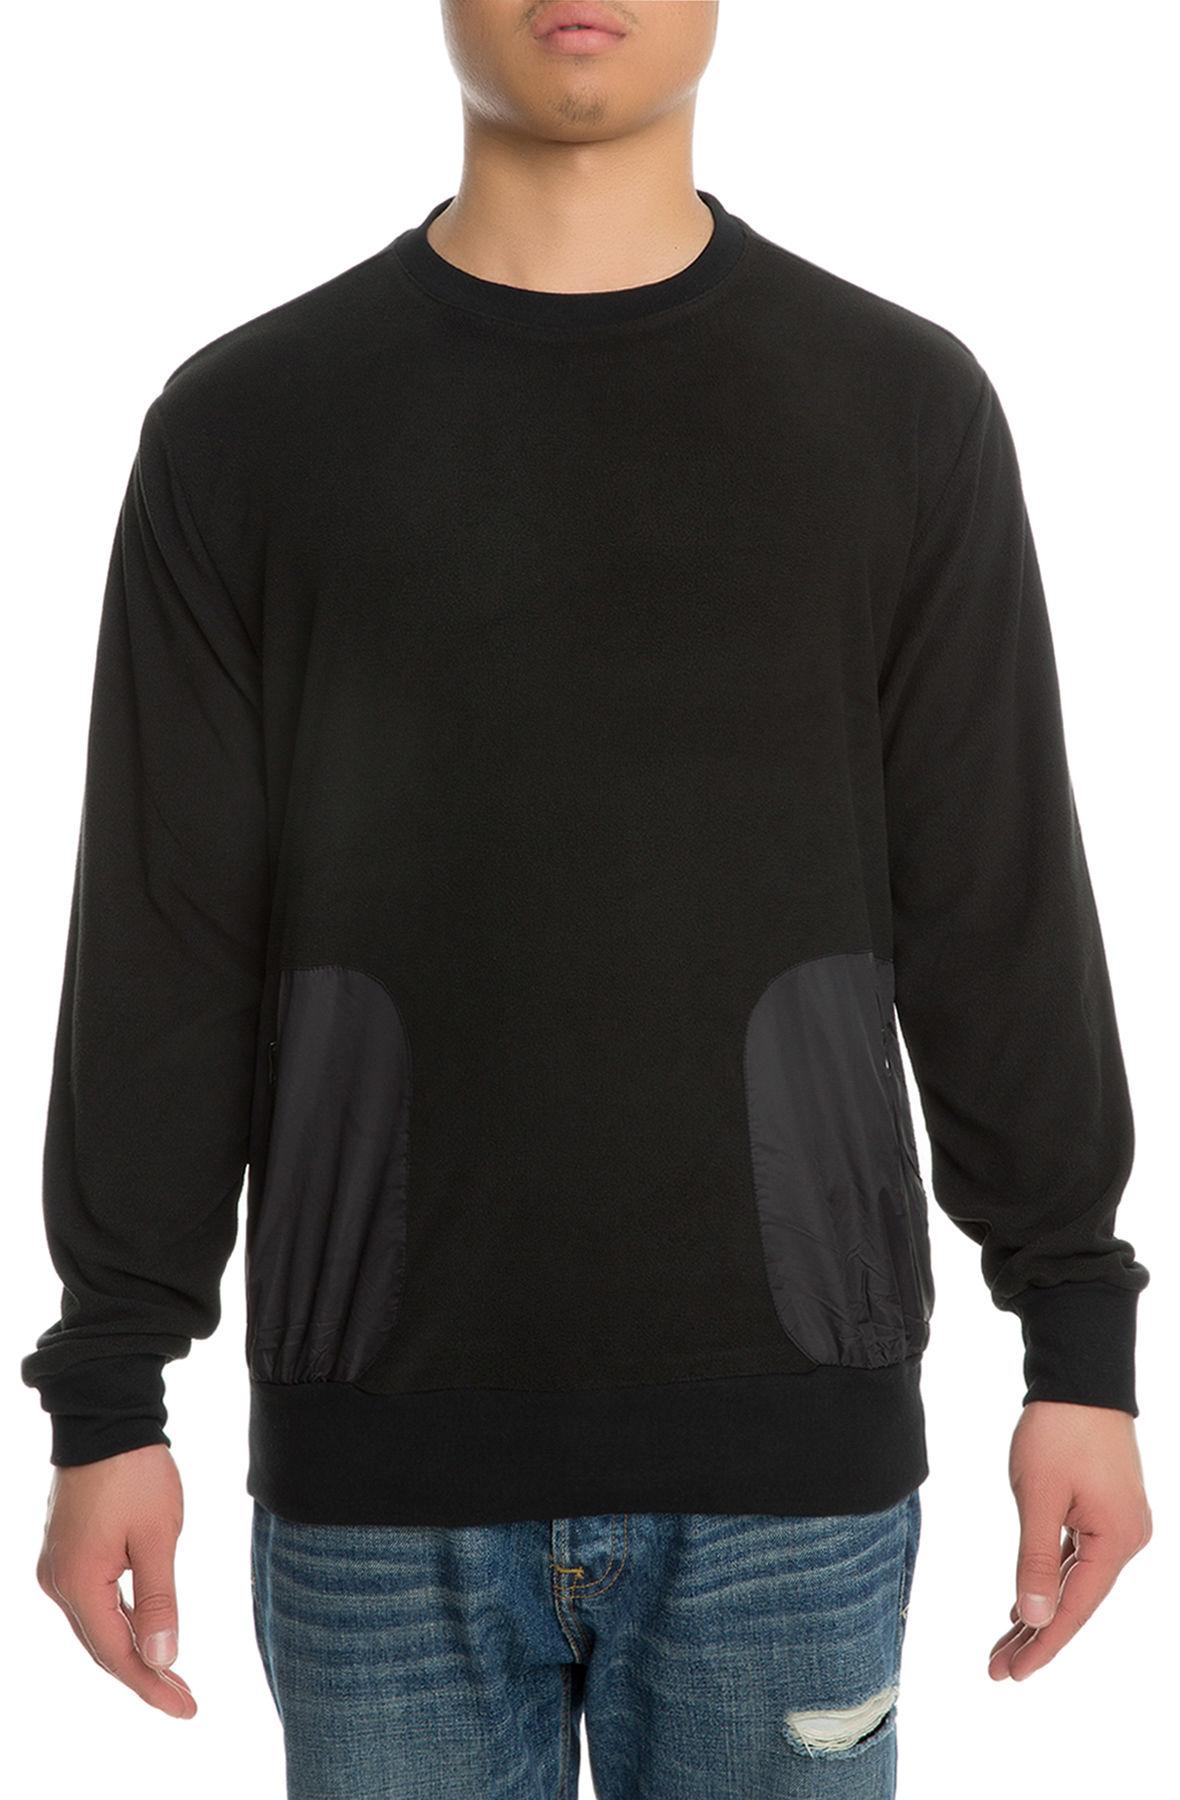 Image of The Monterey Crewneck Sweater in Black